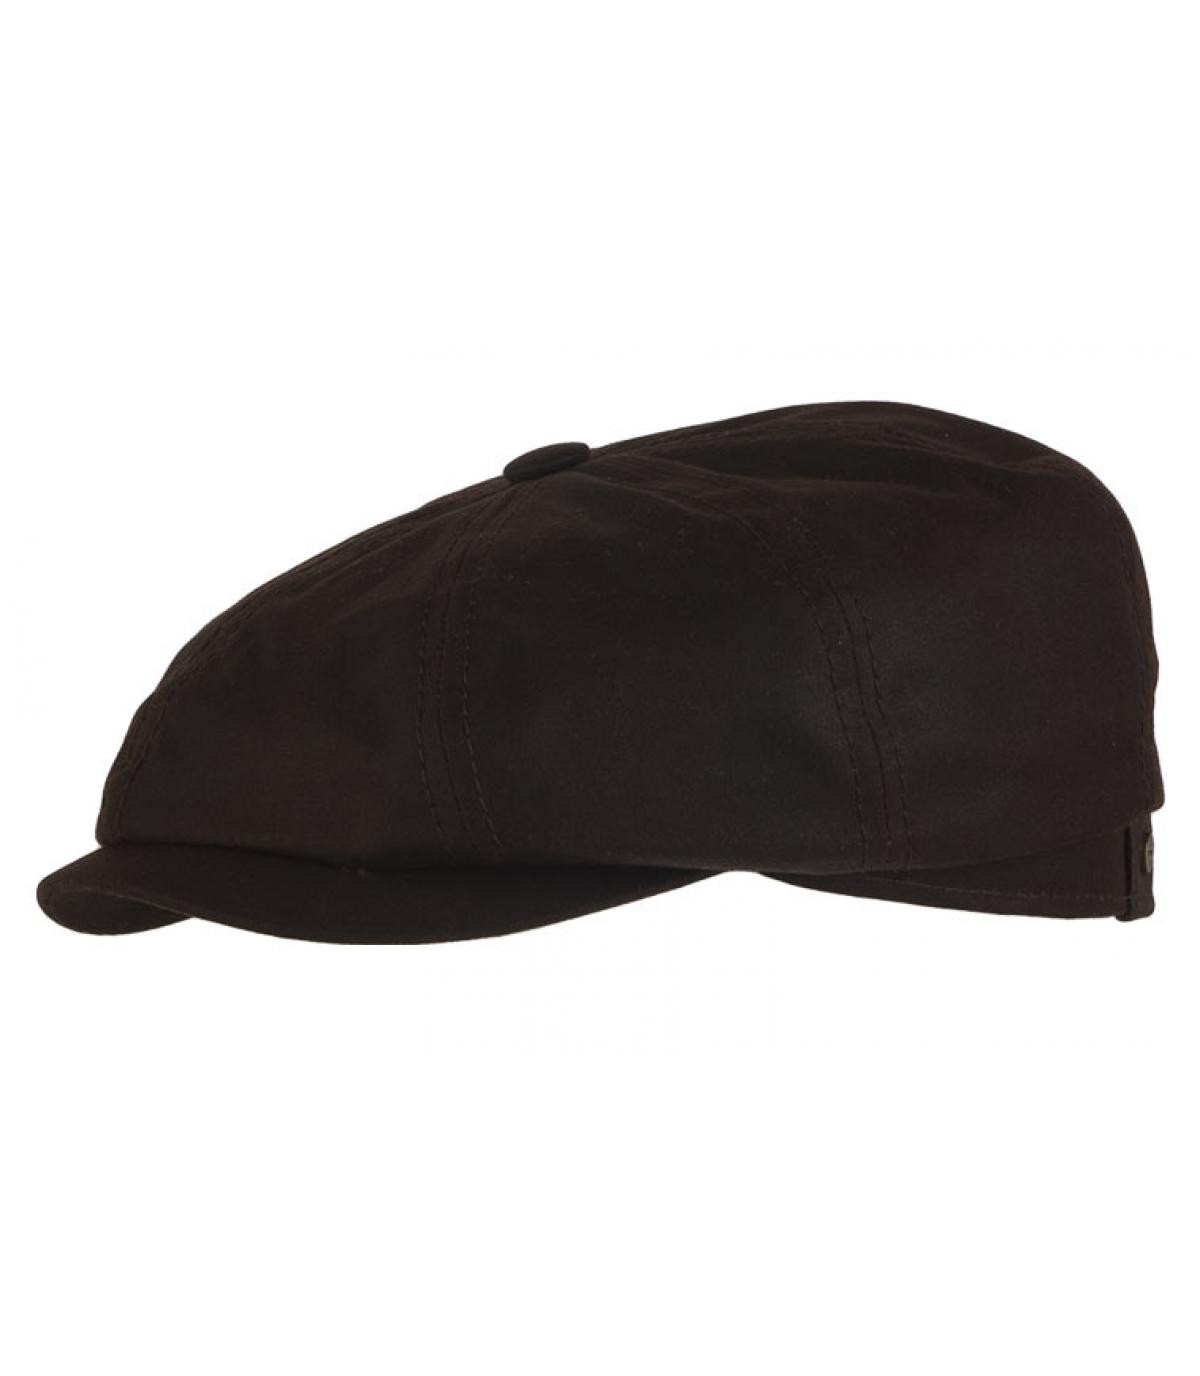 Bruine waxed katoenen hatteras